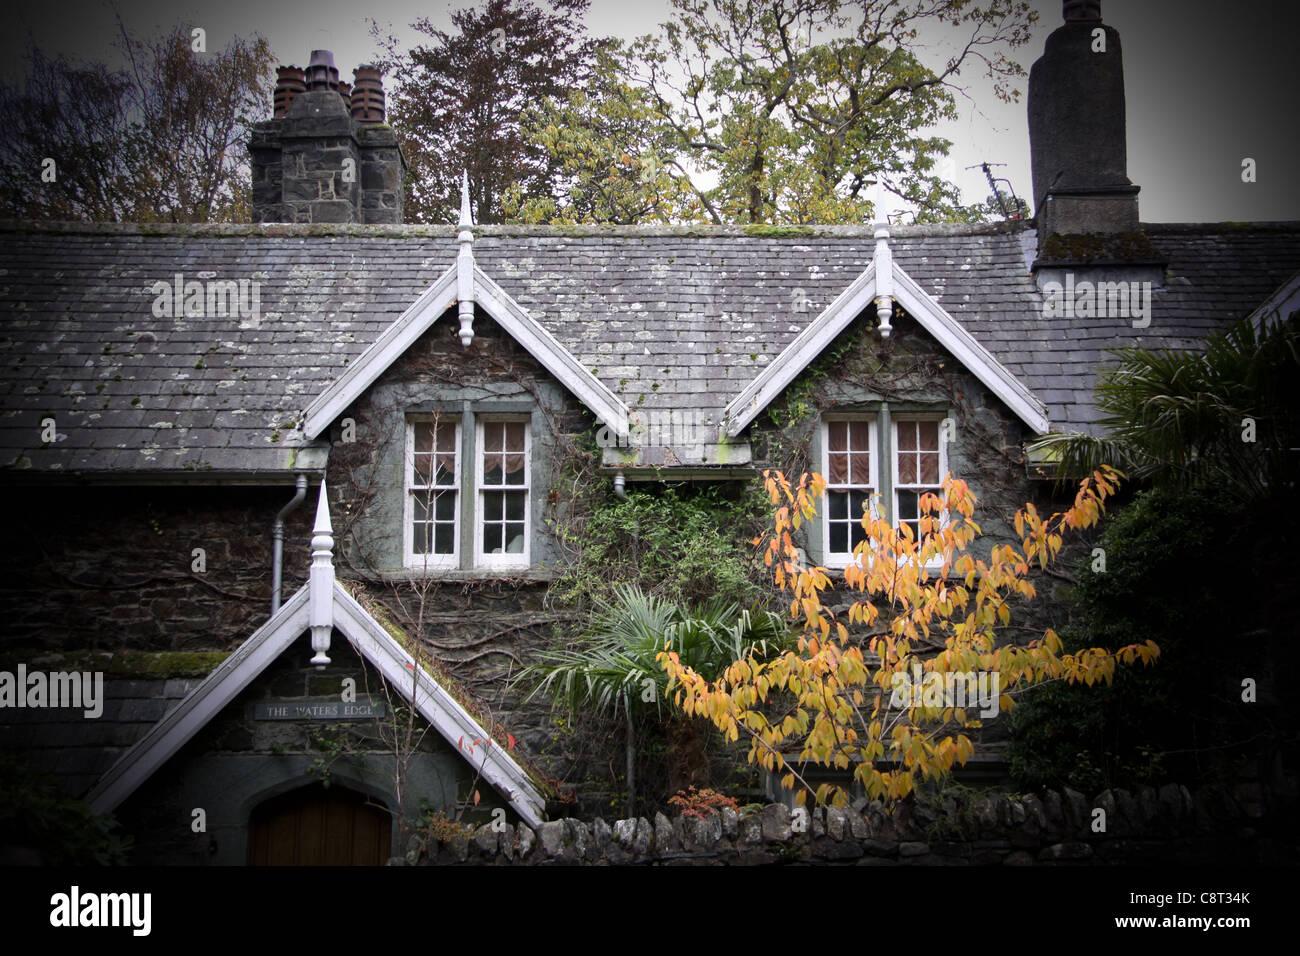 Cottage - Keswick - The Lake District Stock Photo, Royalty Free ...